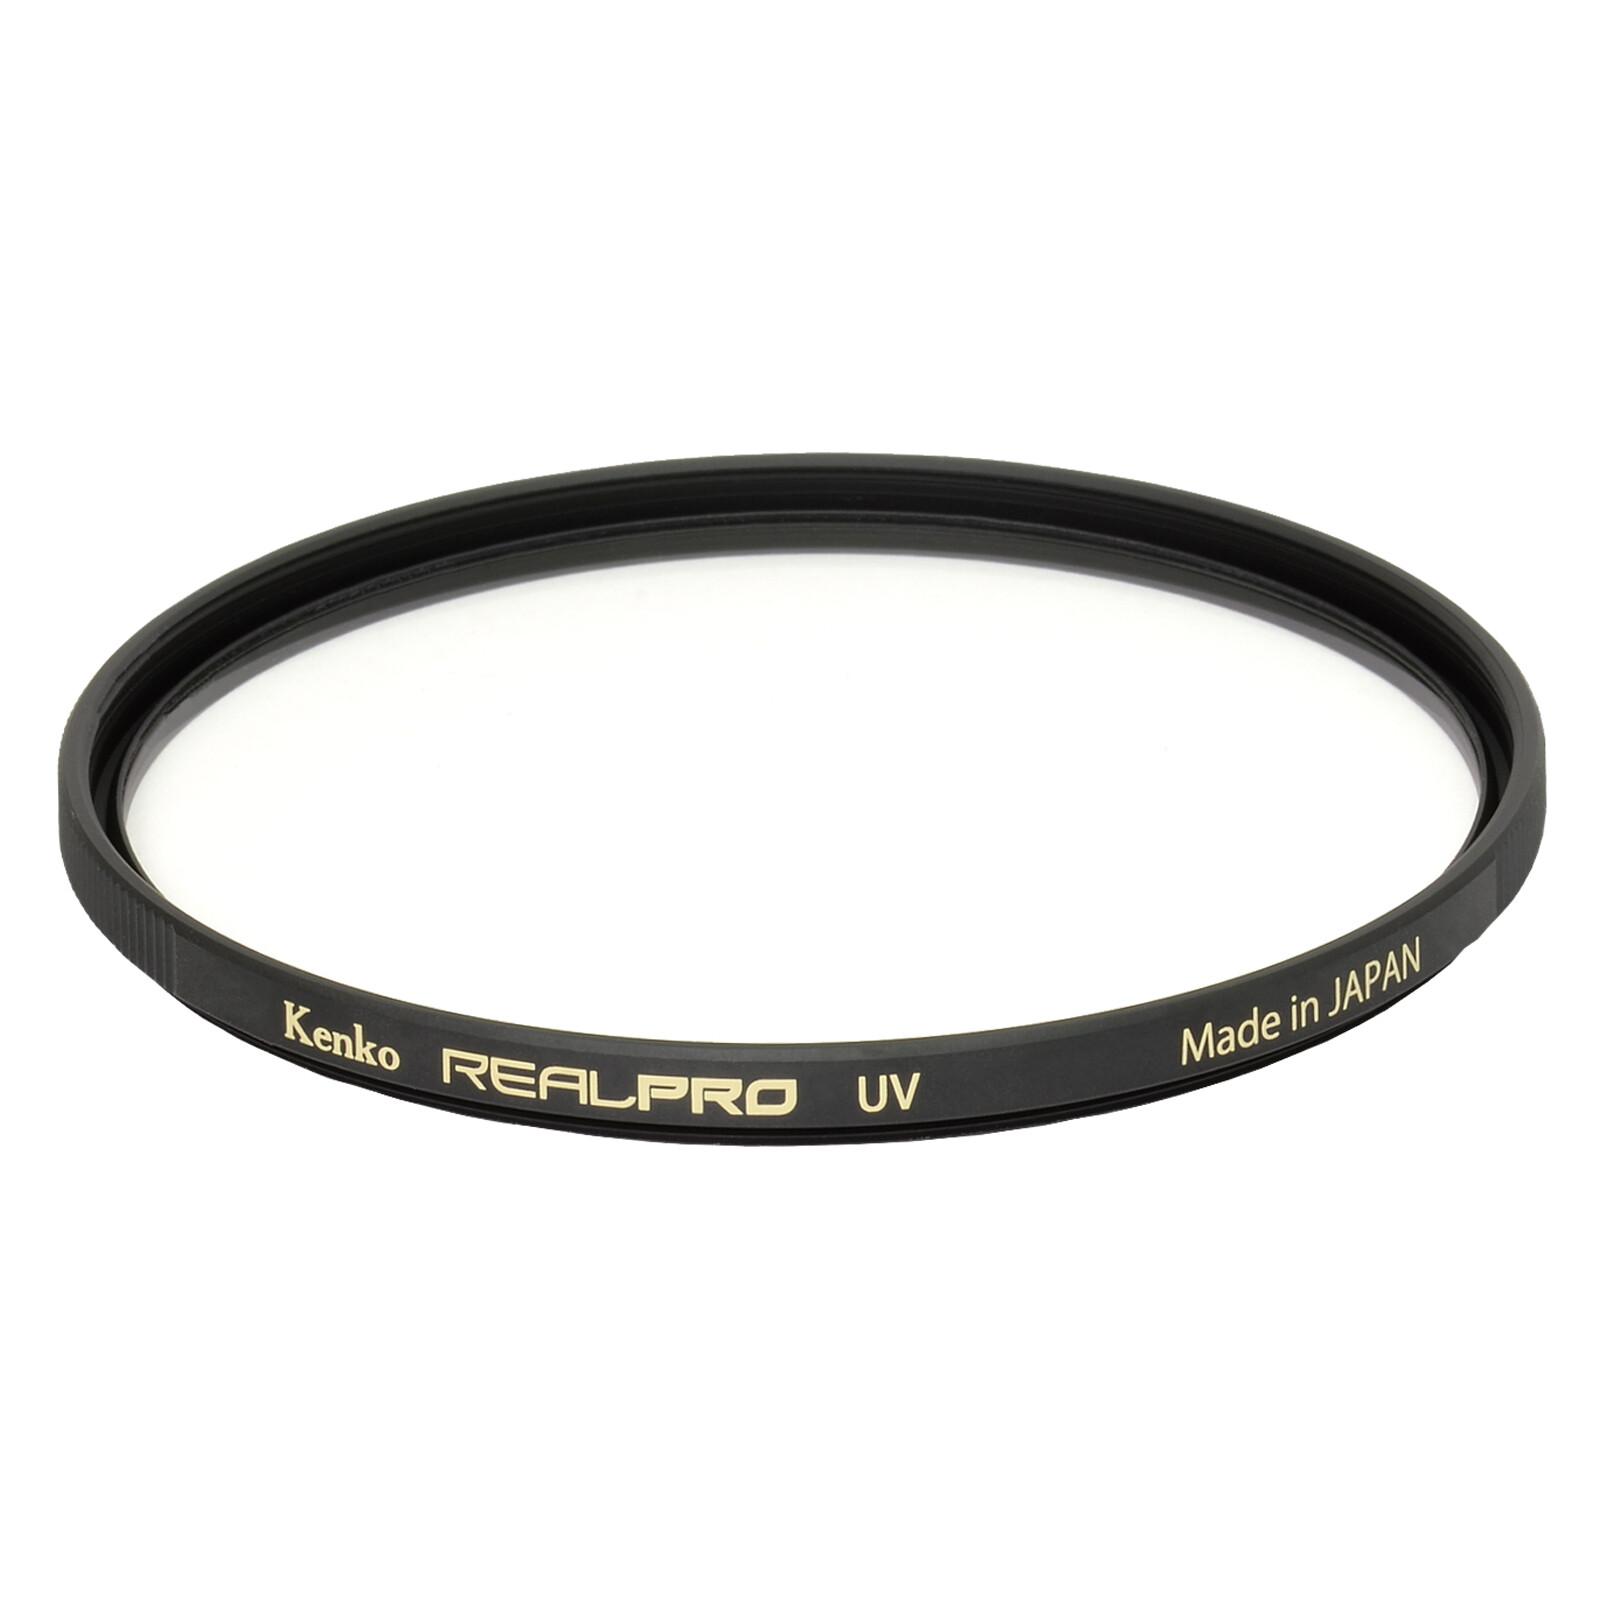 Kenko Real Pro UV 55mm Slim